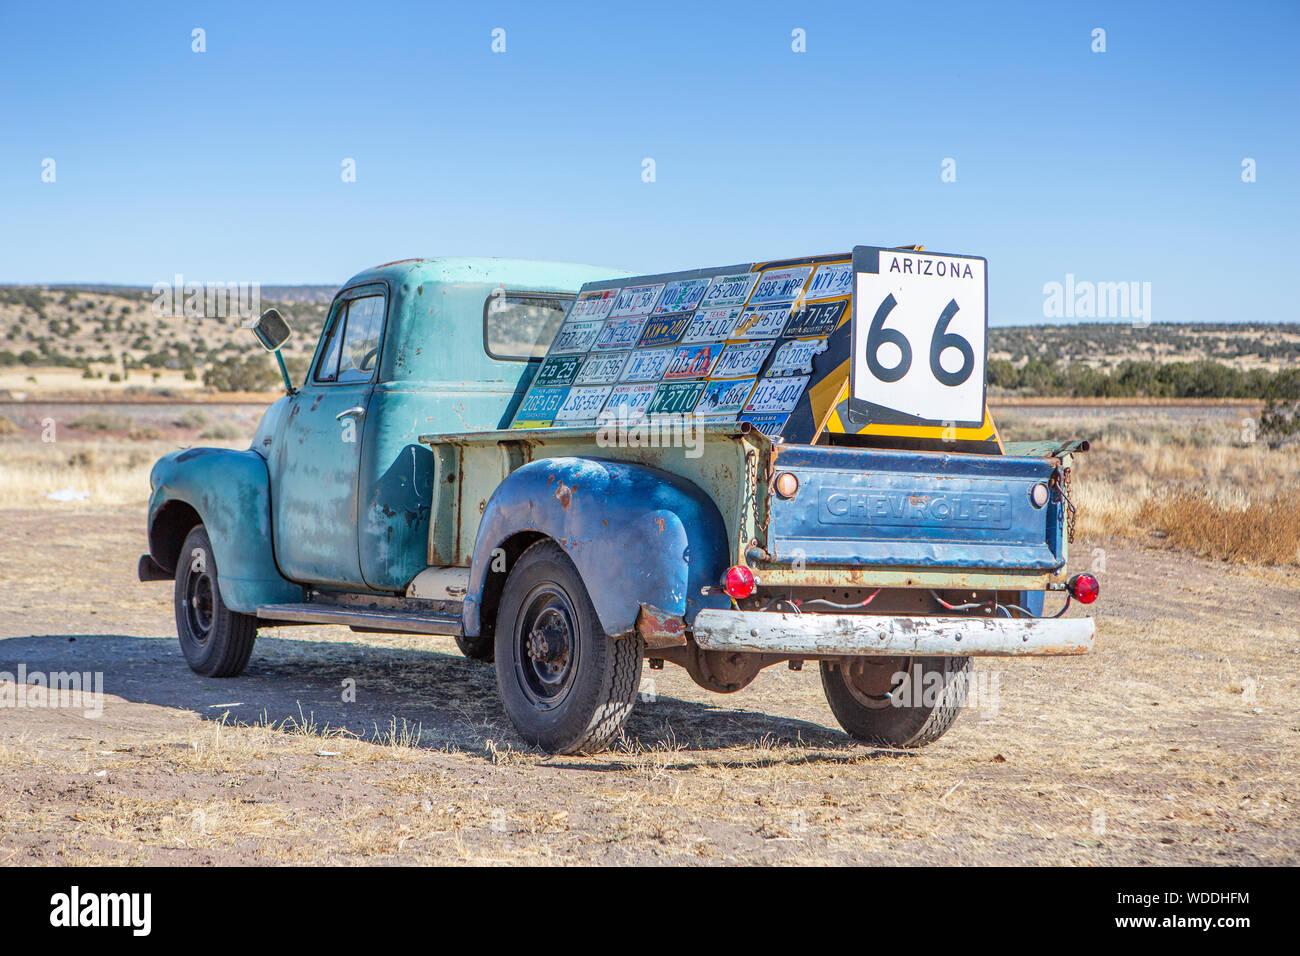 A Chevy truck at Ash Fork, Arizona Stock Photo